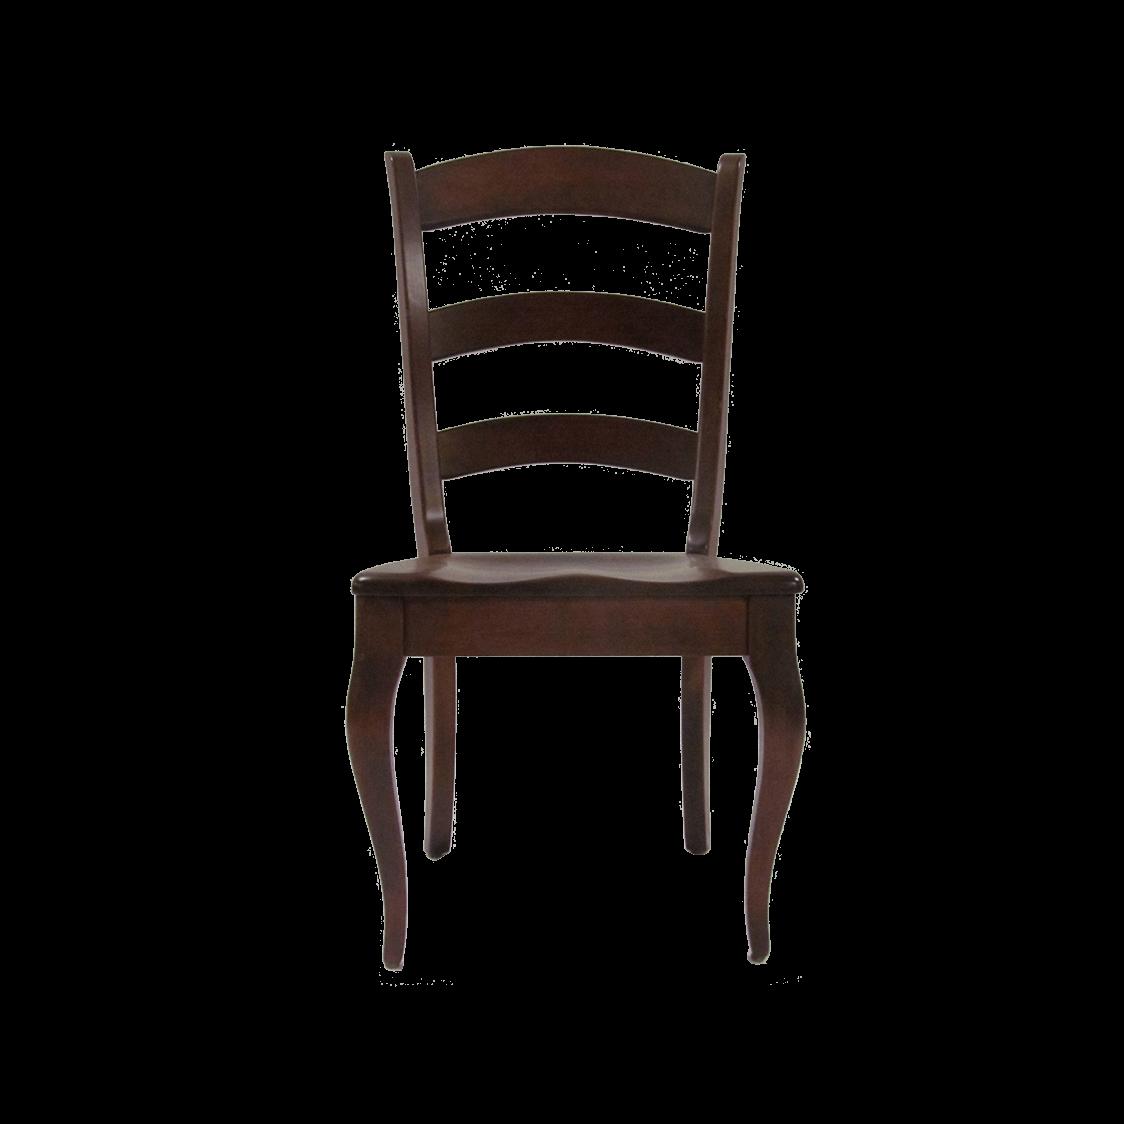 229946_Nichols&Stone_Side_Chair